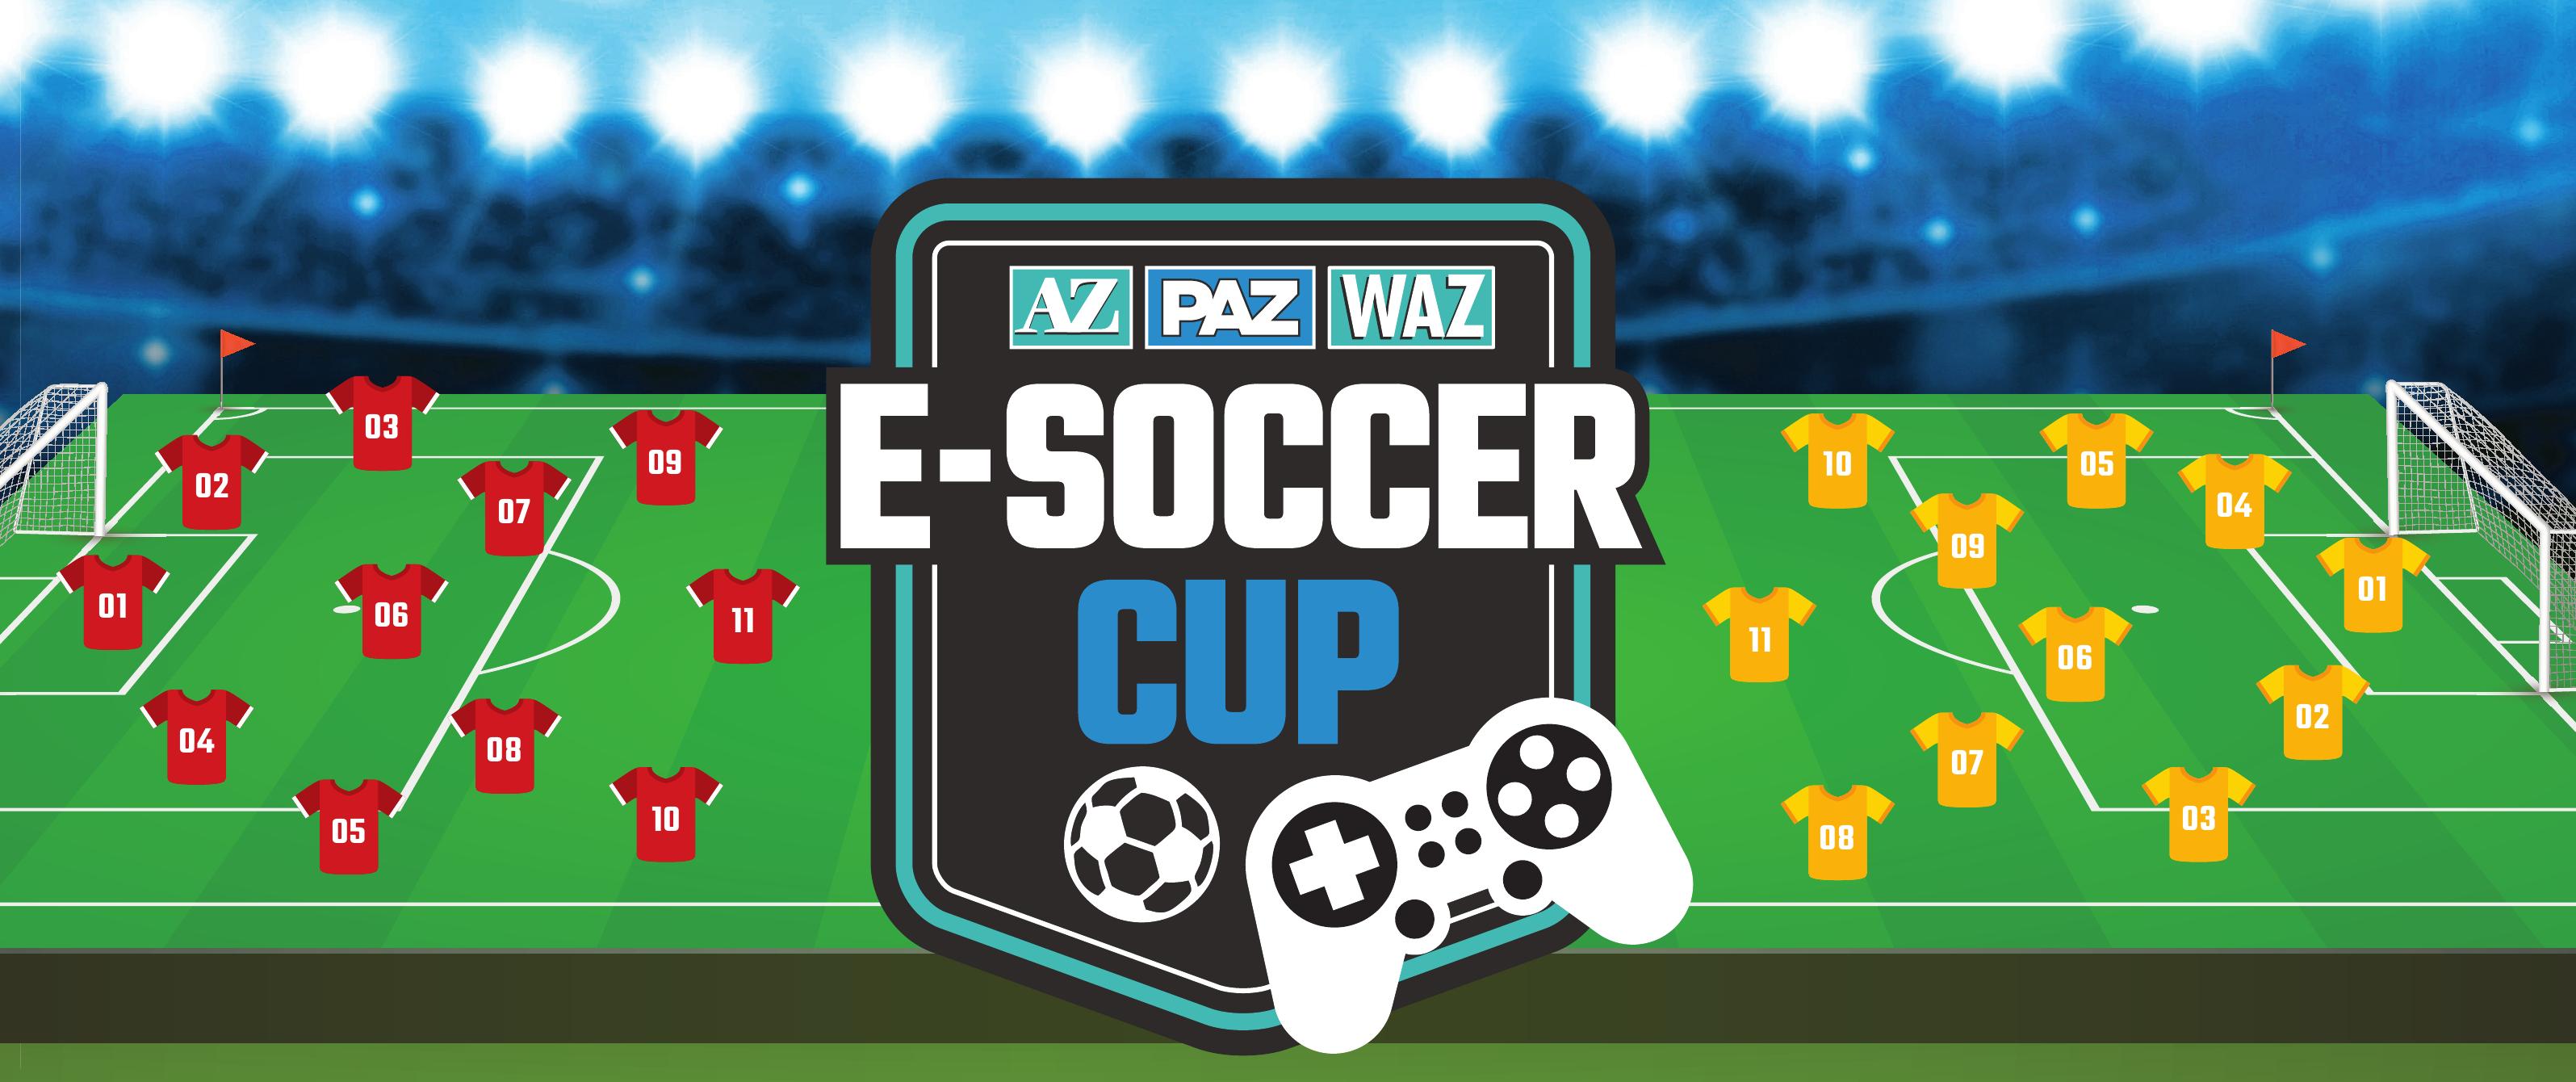 Anpfiff für den E-Soccer-Cup Image 1